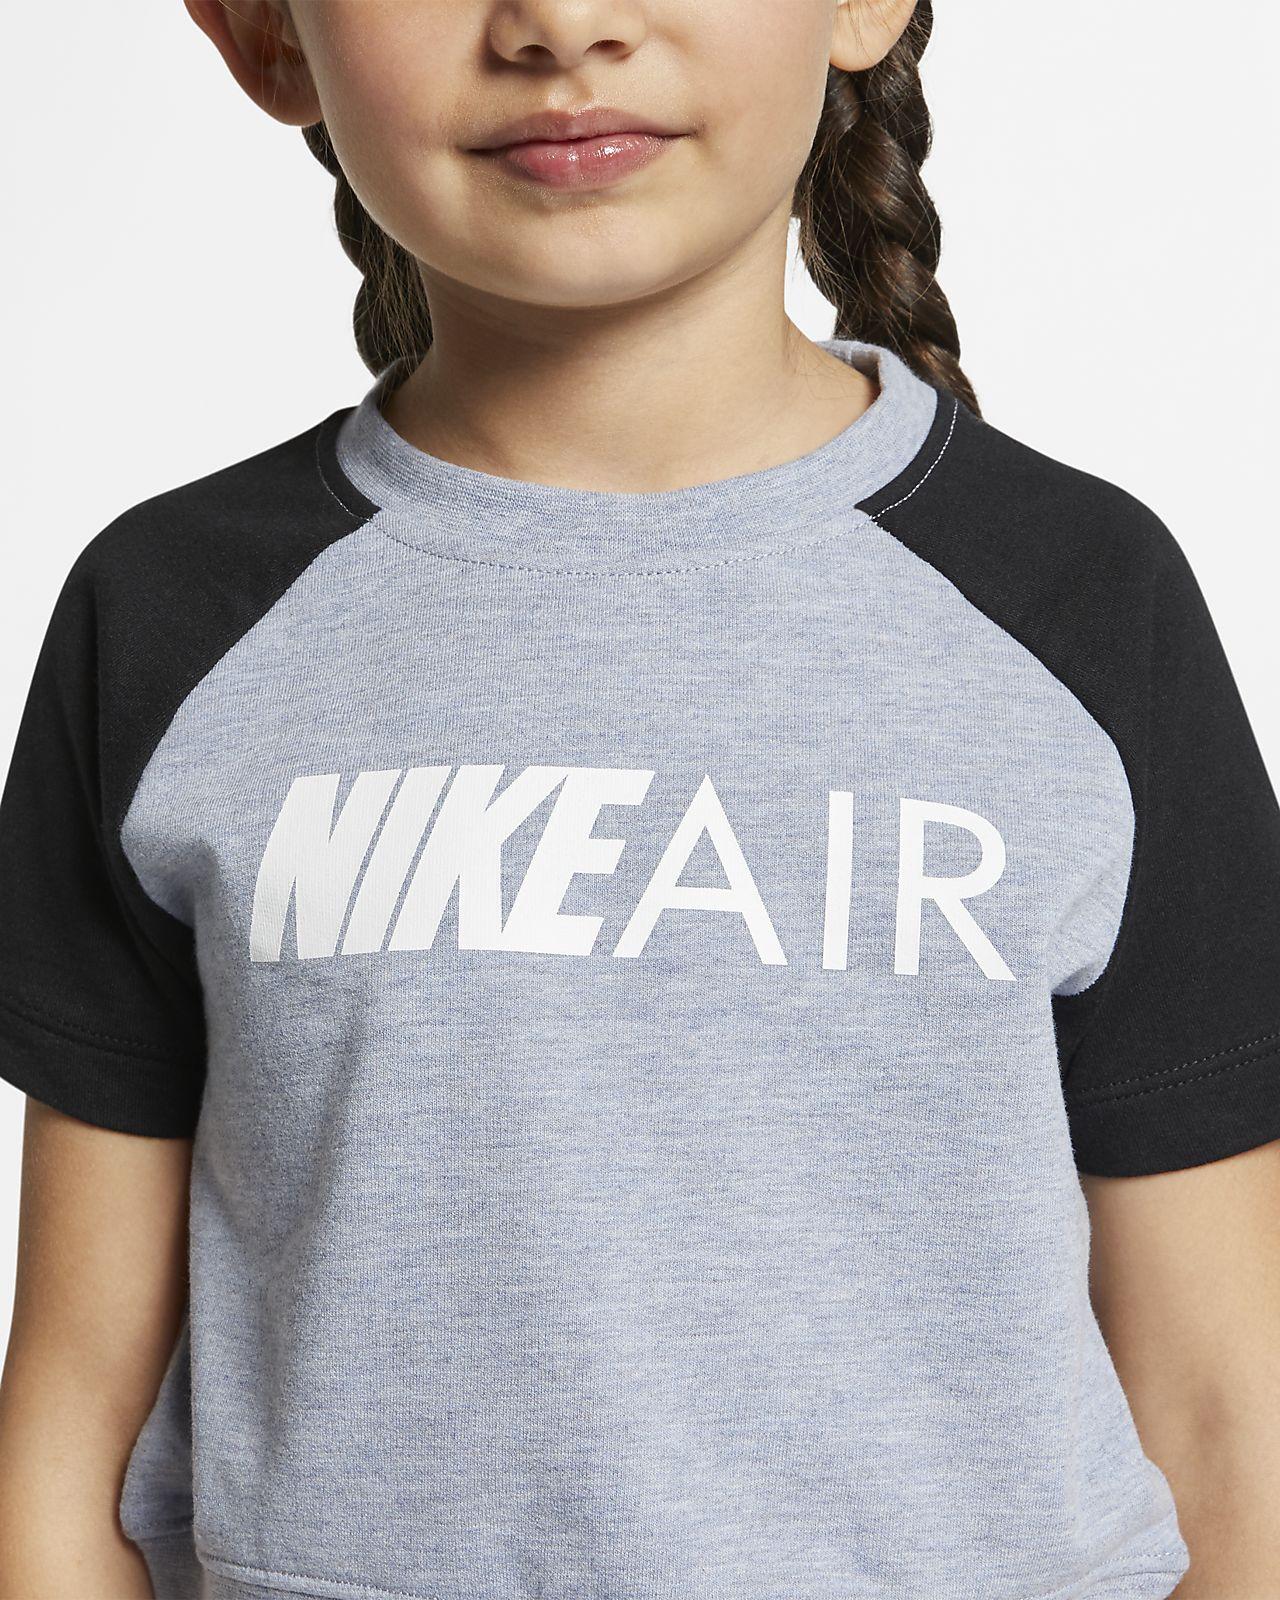 2222040c7f7 Nike Air Little Kids' Cropped Top. Nike.com